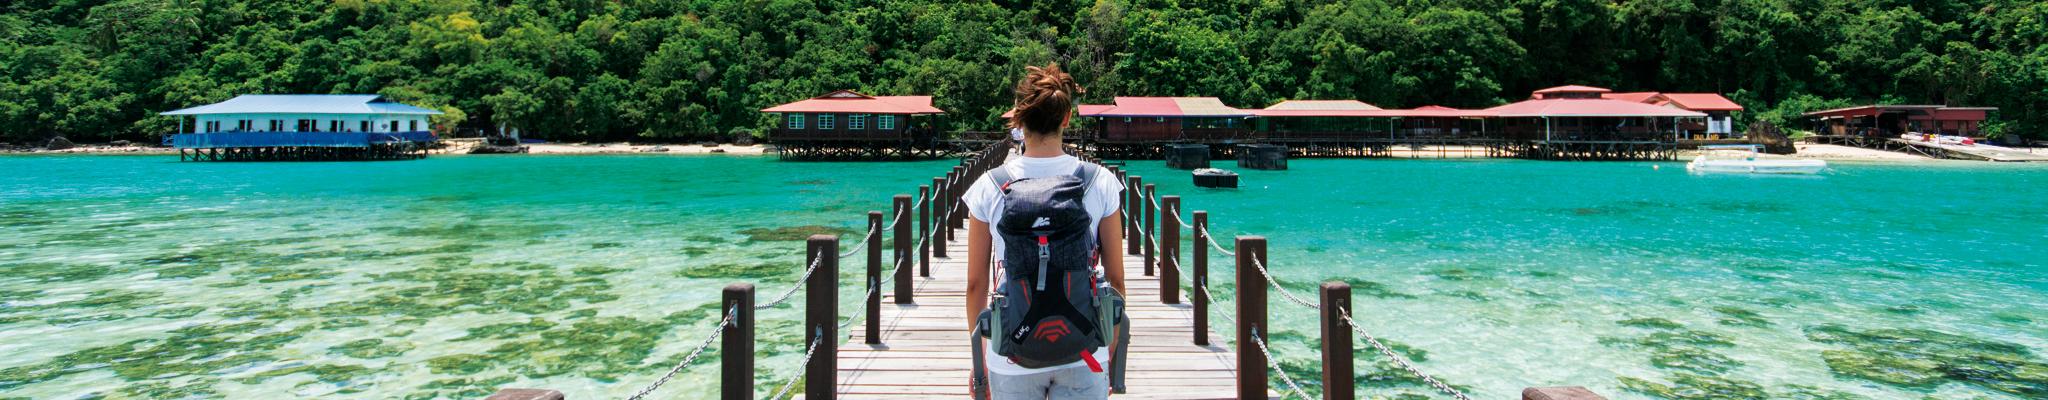 Ragazza che cammina su un pontile a Bohey Dulang Island con zaino Blanc 25